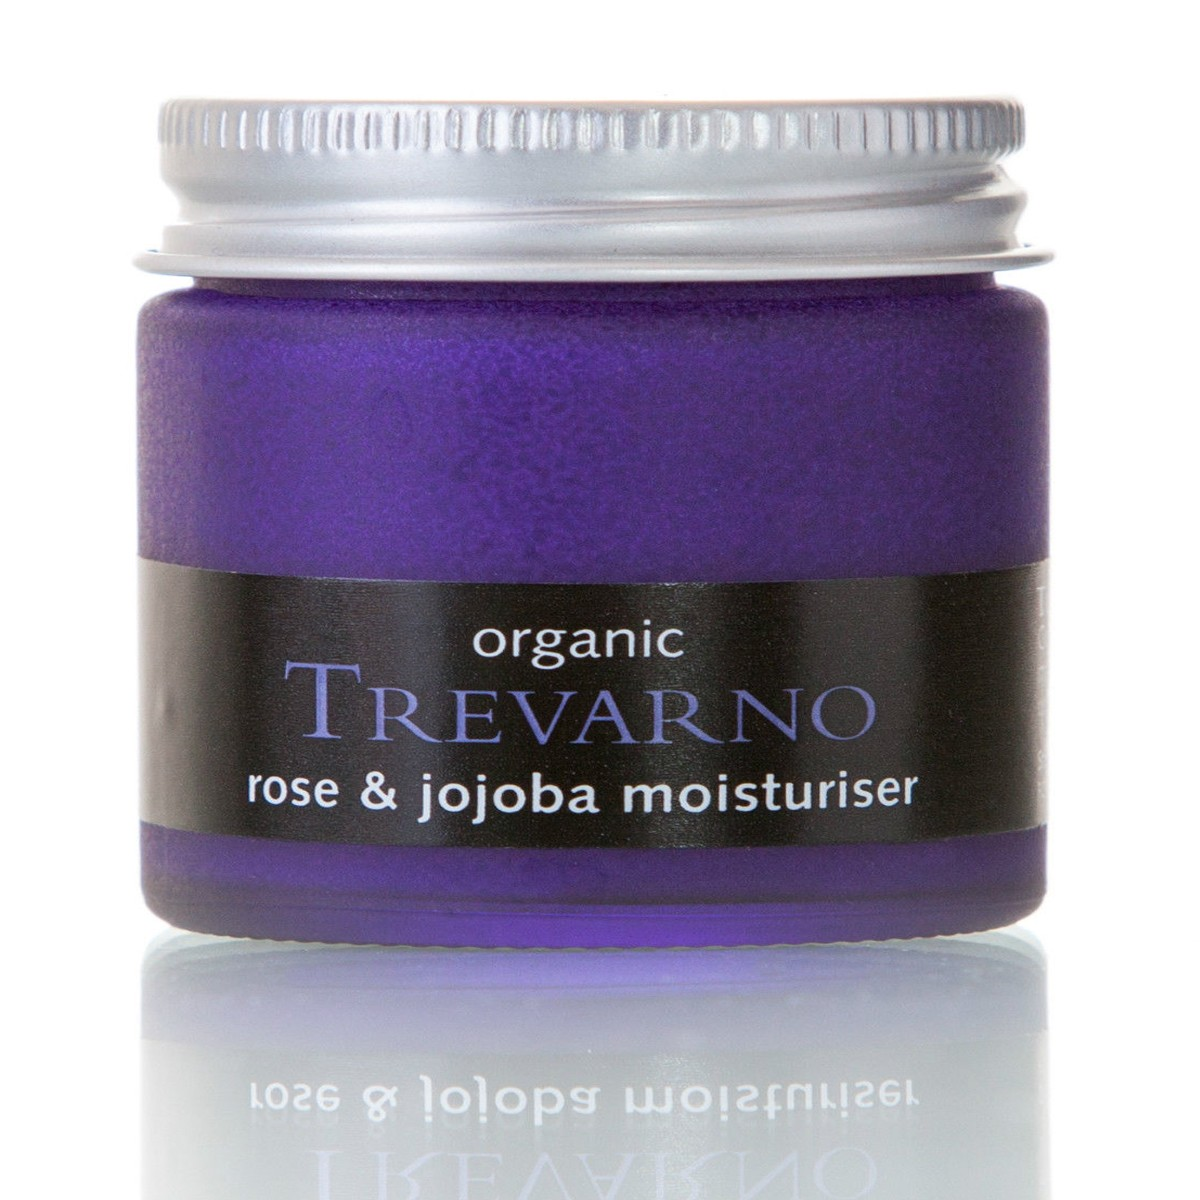 Organic Trevarno Rose & Jojoba Moisturiser